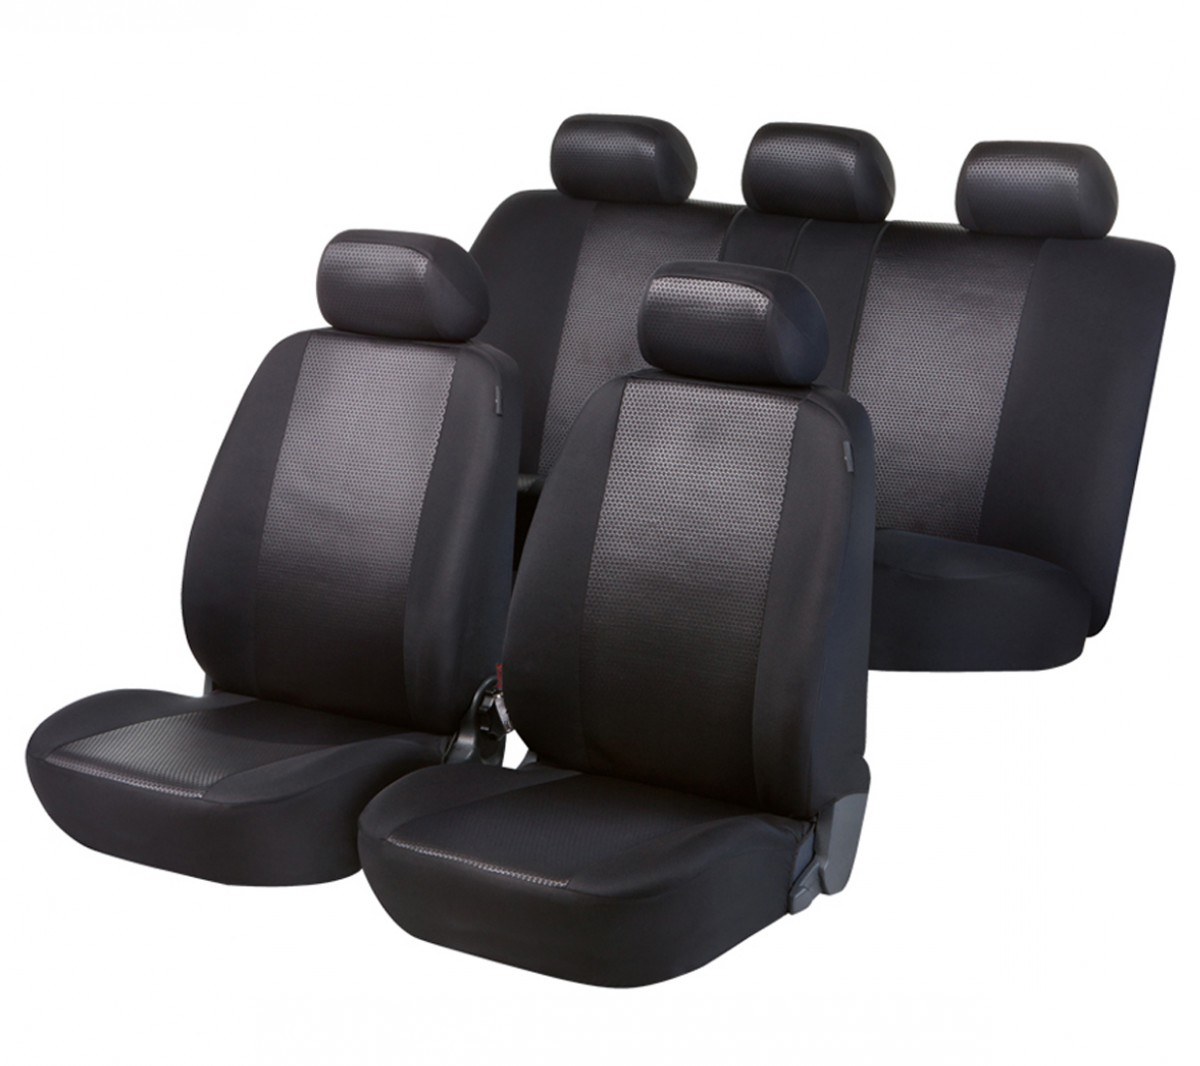 autositzbezug schonbezug komplett set toyota rav4. Black Bedroom Furniture Sets. Home Design Ideas